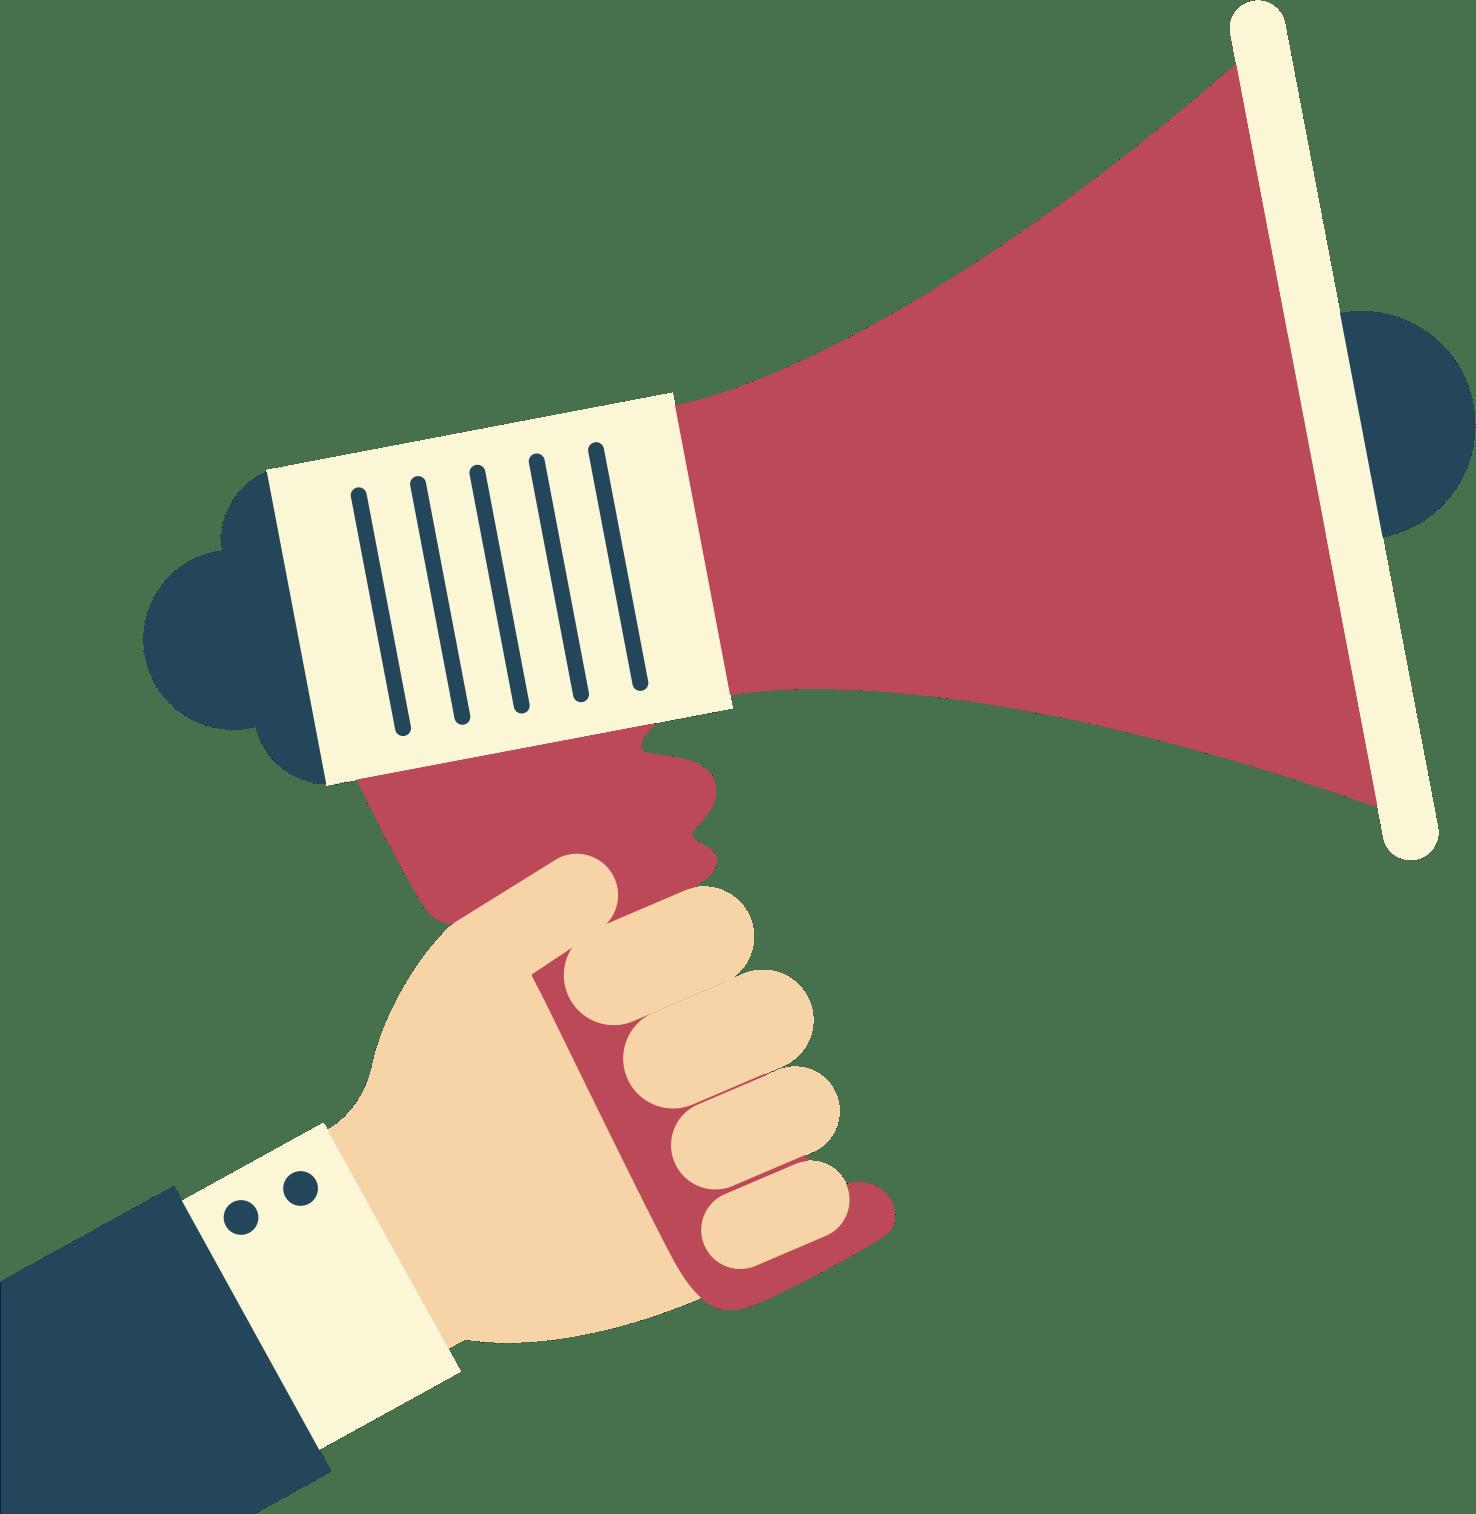 PENGUMUMAN PPDB 2018 JALUR OFFLINE